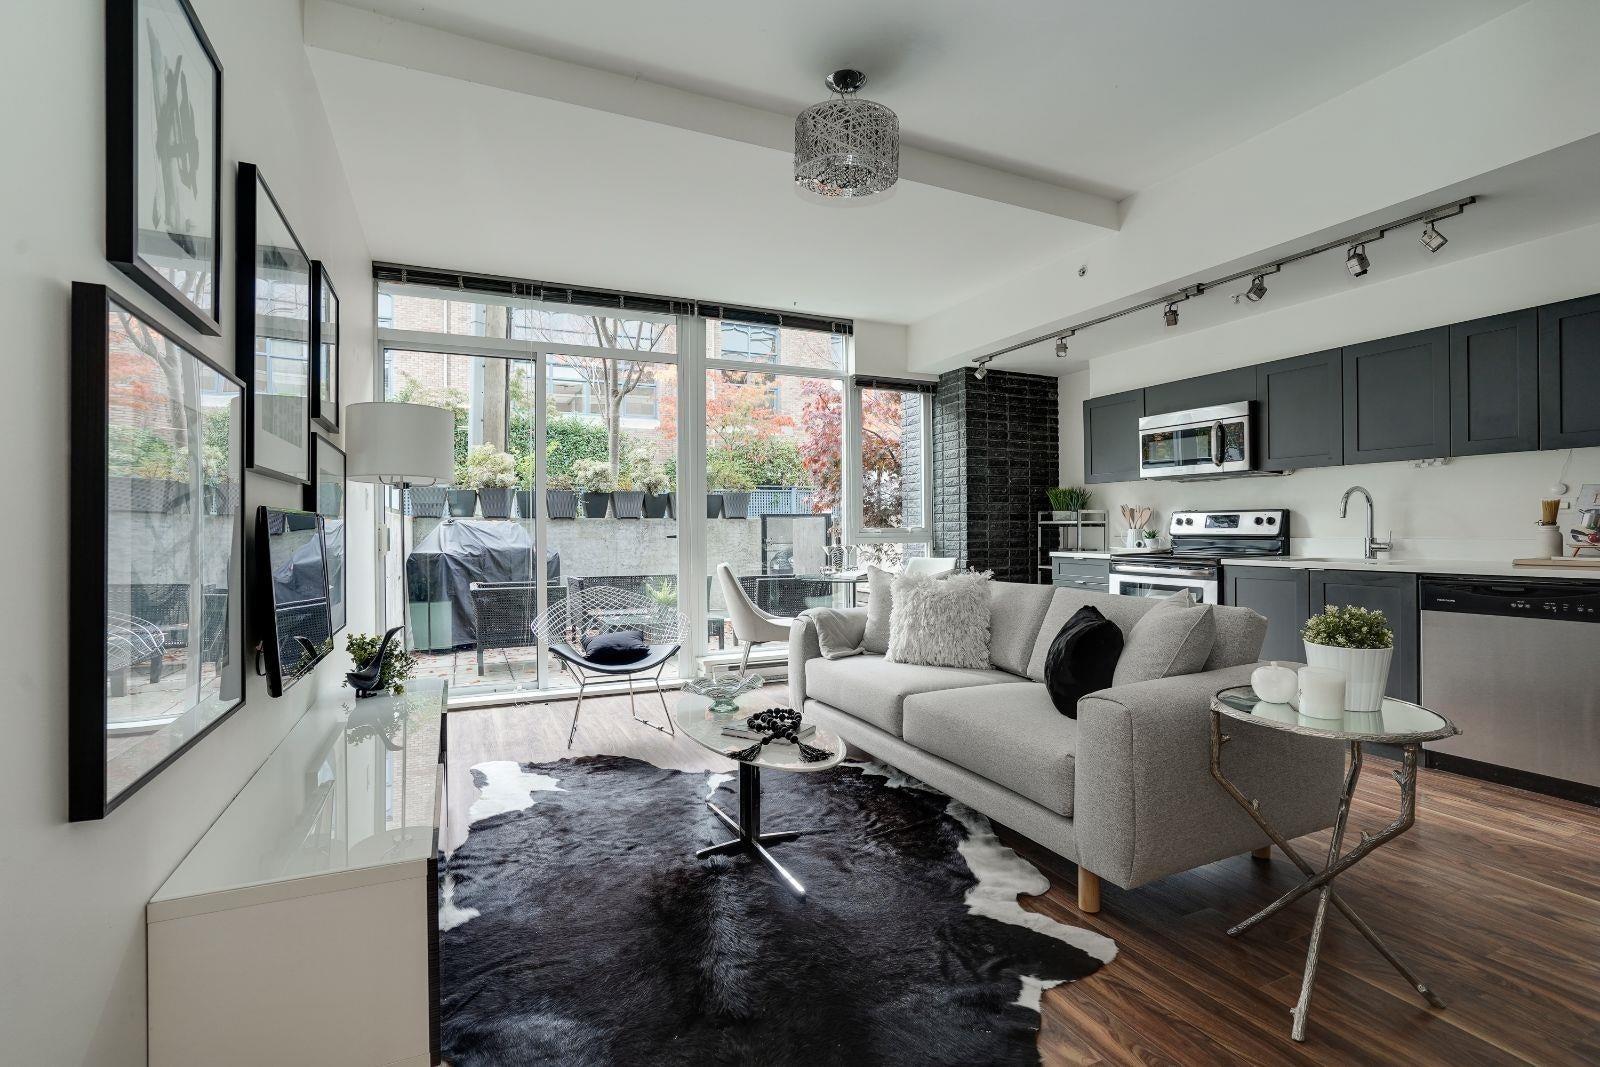 101 2511 QUEBEC STREET - Mount Pleasant VE Apartment/Condo for sale, 1 Bedroom (R2628316) - #1